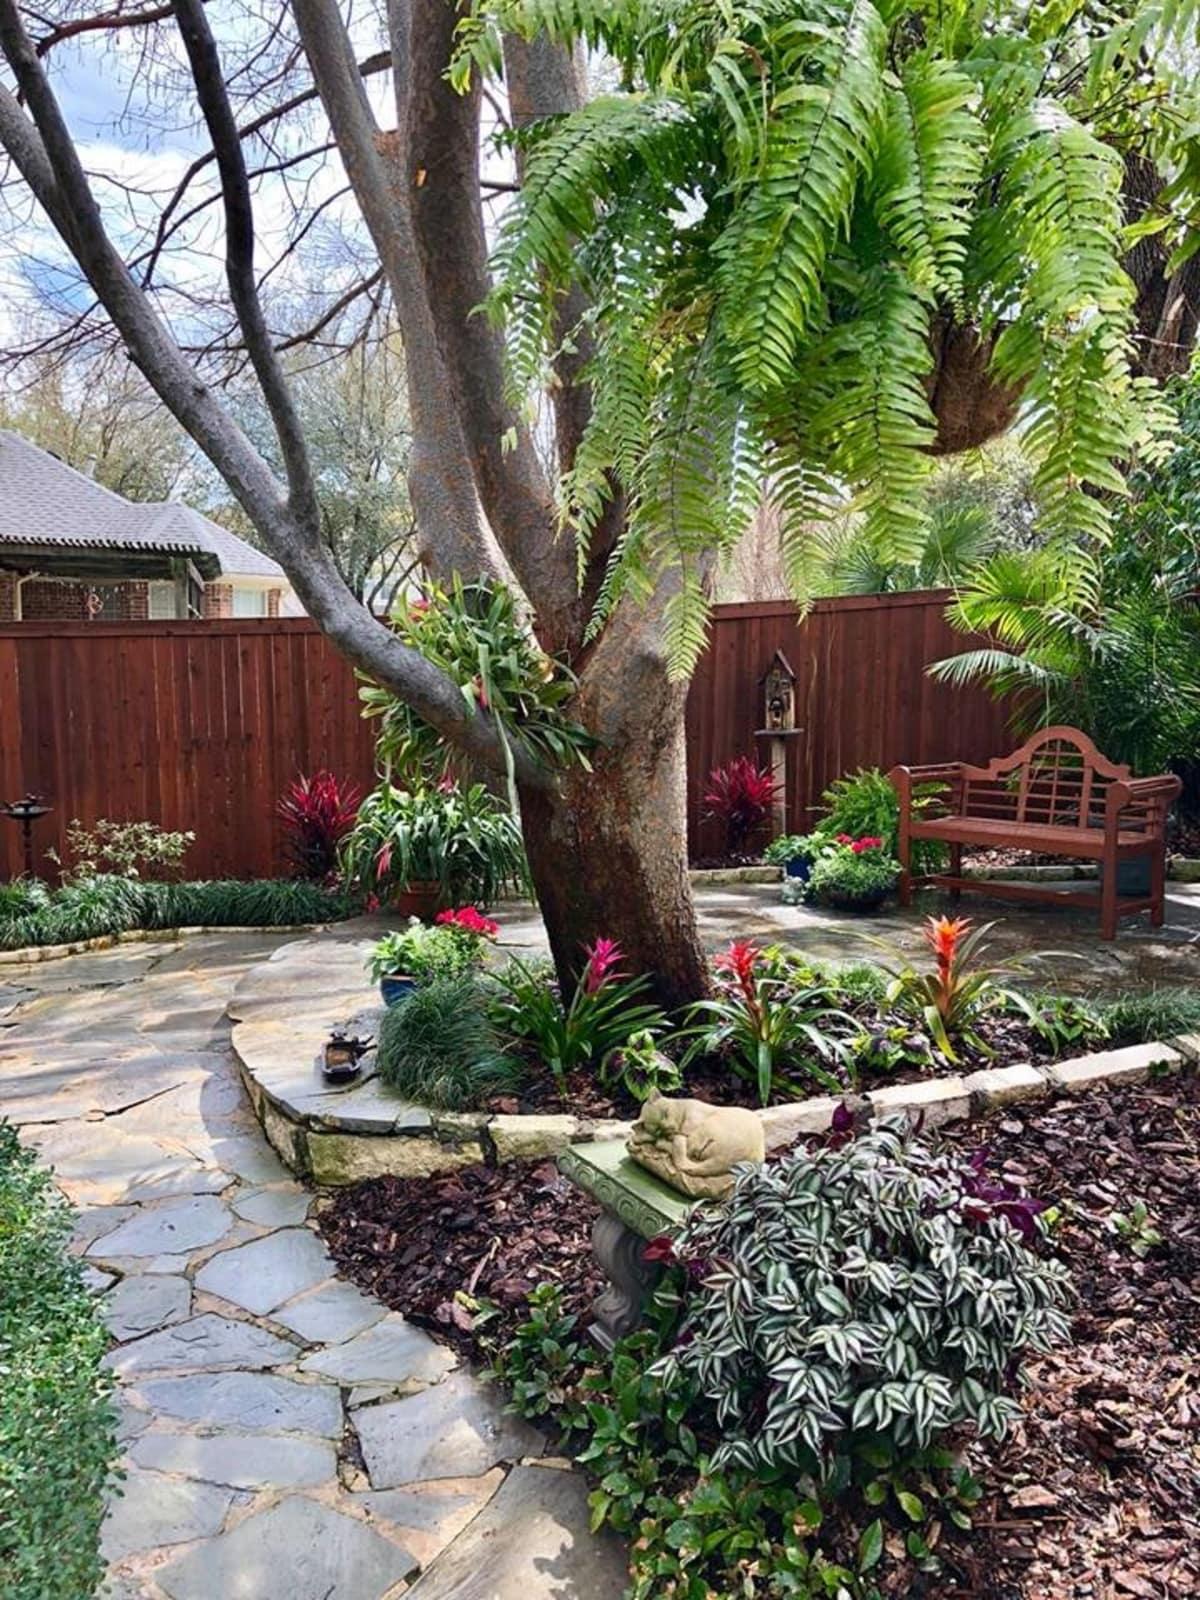 Colleyville Garden Promenade 2018